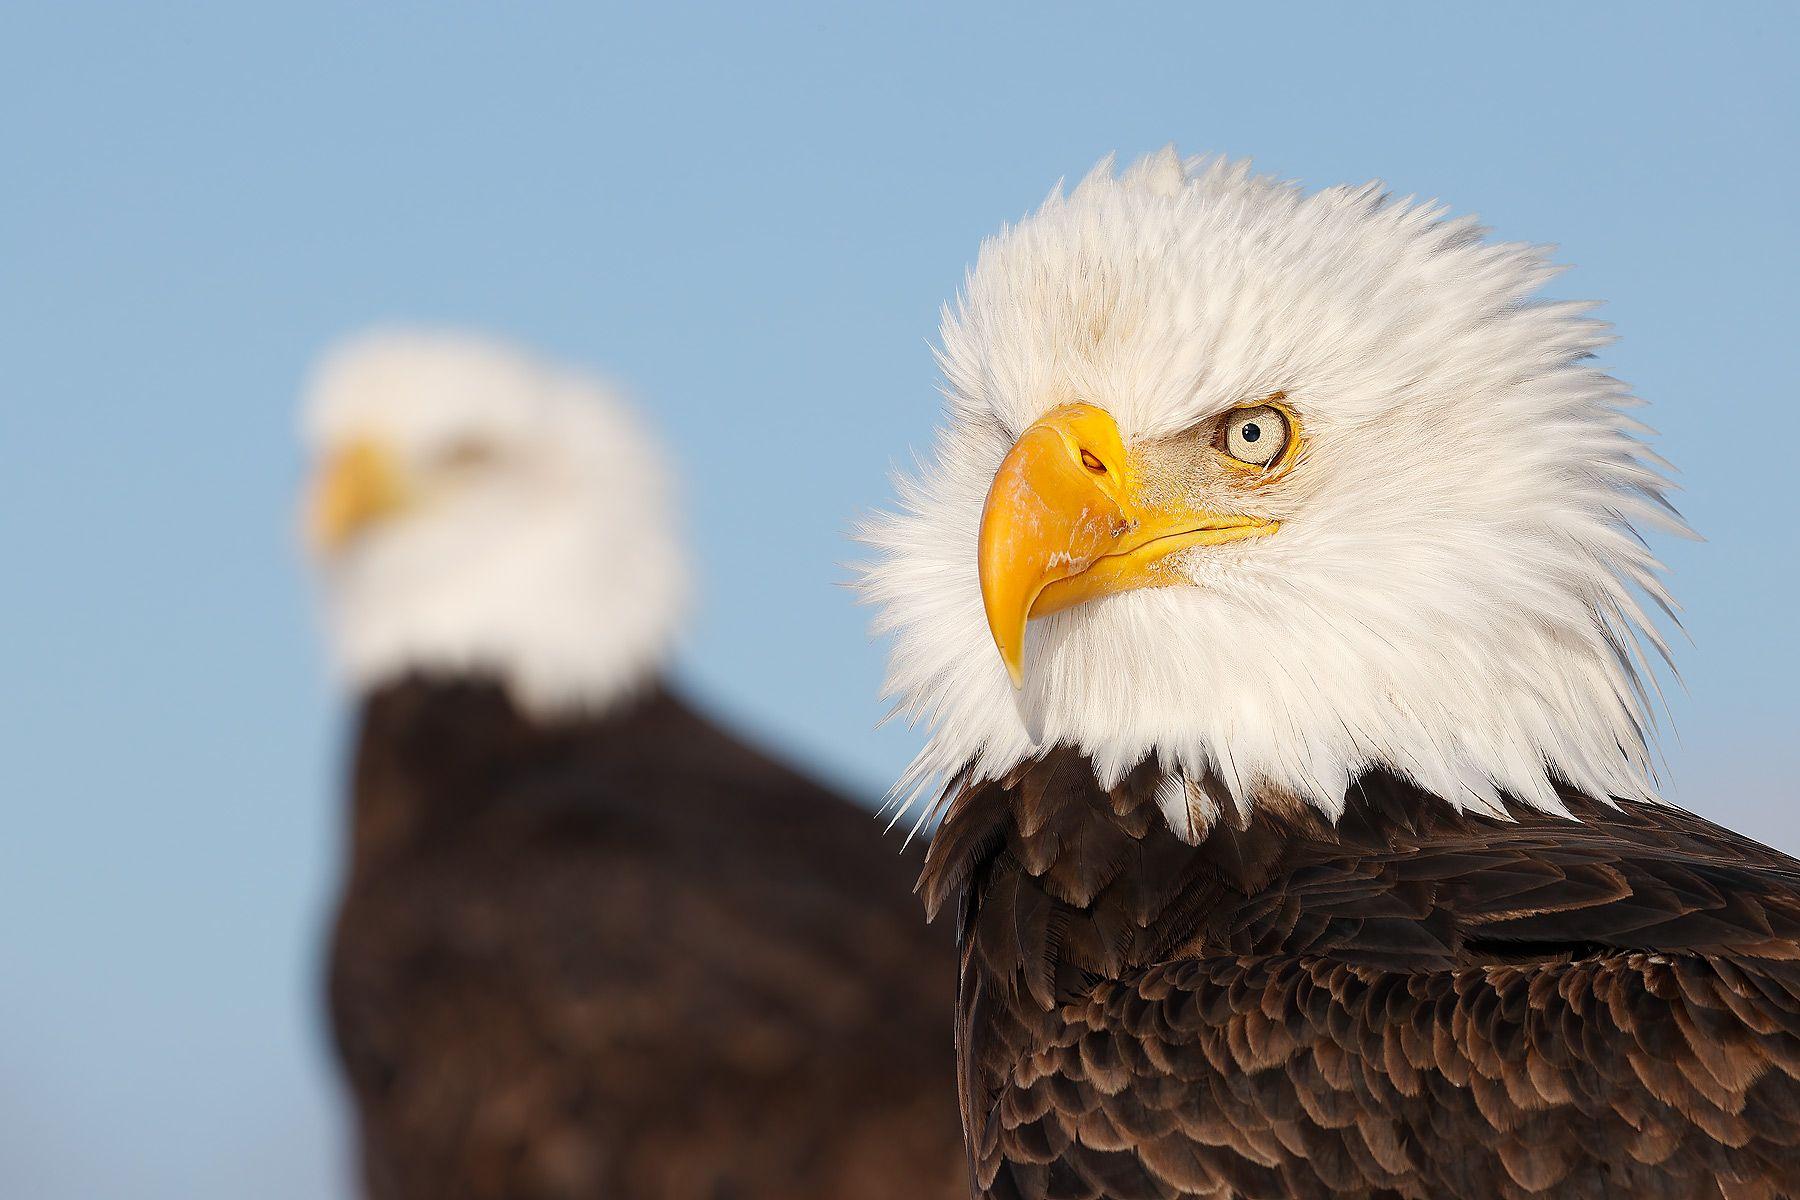 Bald-eagles-juxtaposition_74I4627-Kachemak-Bay,-Alaska,-USA.jpg